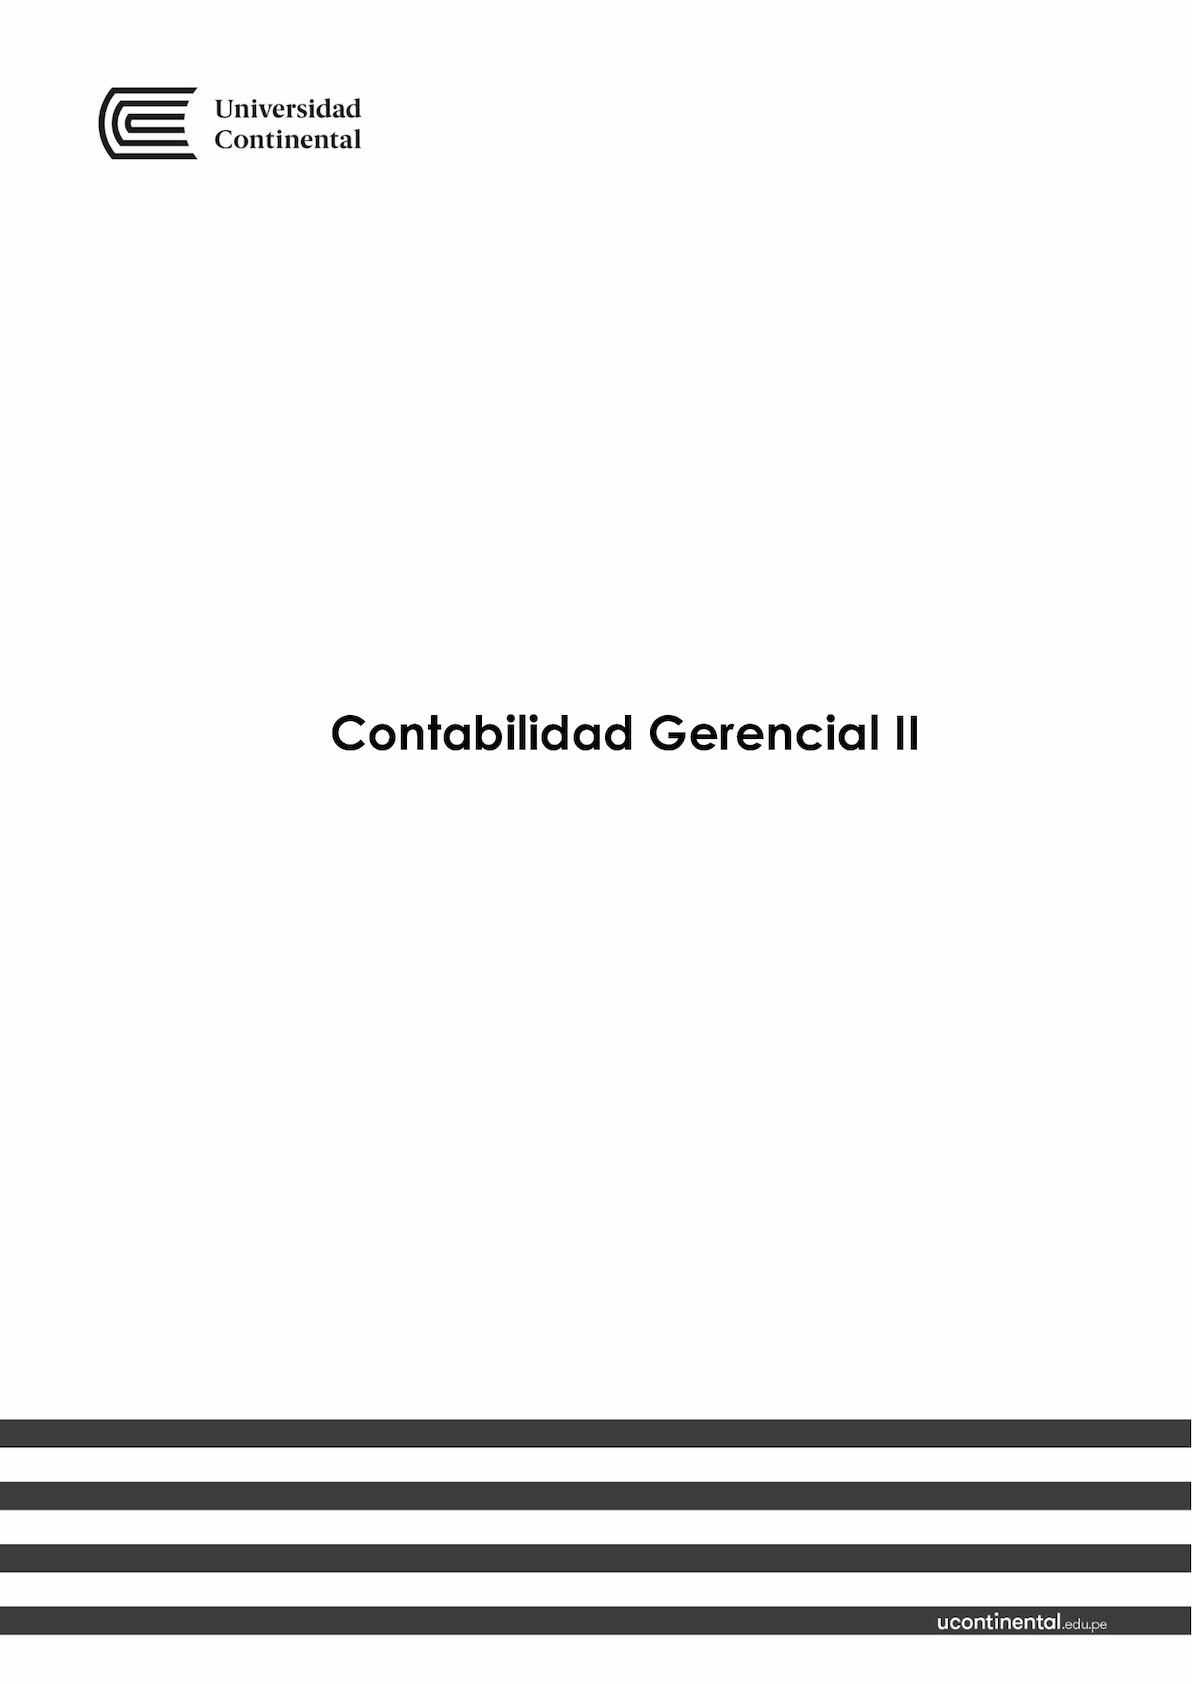 Calaméo - TEXTO CONTABILIDAD GERENCIAL II 2017